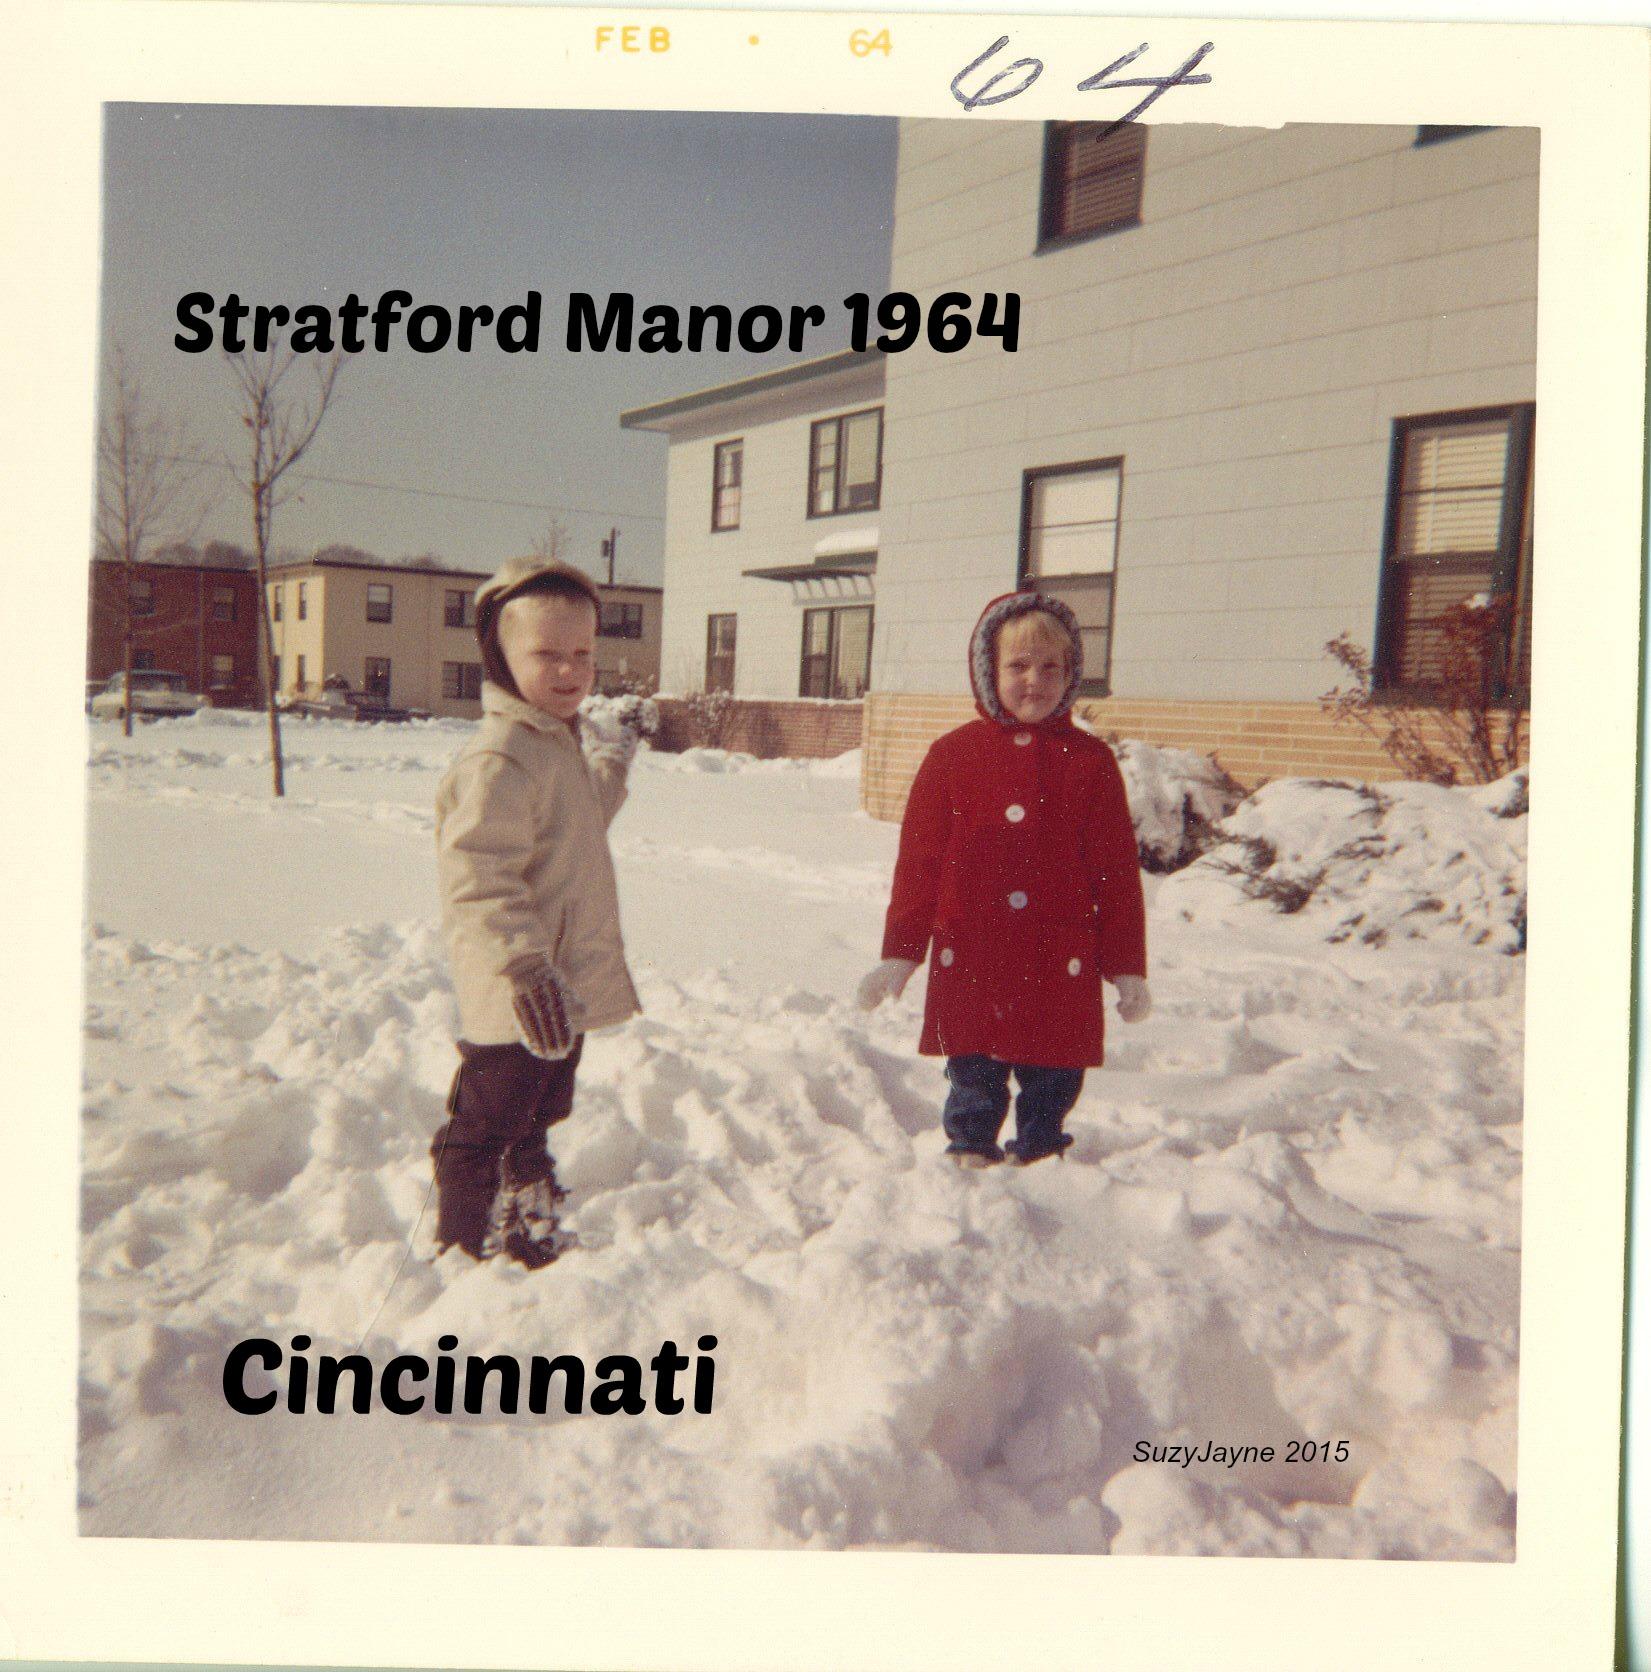 Eastwood Village Apartments: 1950's-1970's Stratford Manor & Eastwood Village (Deer